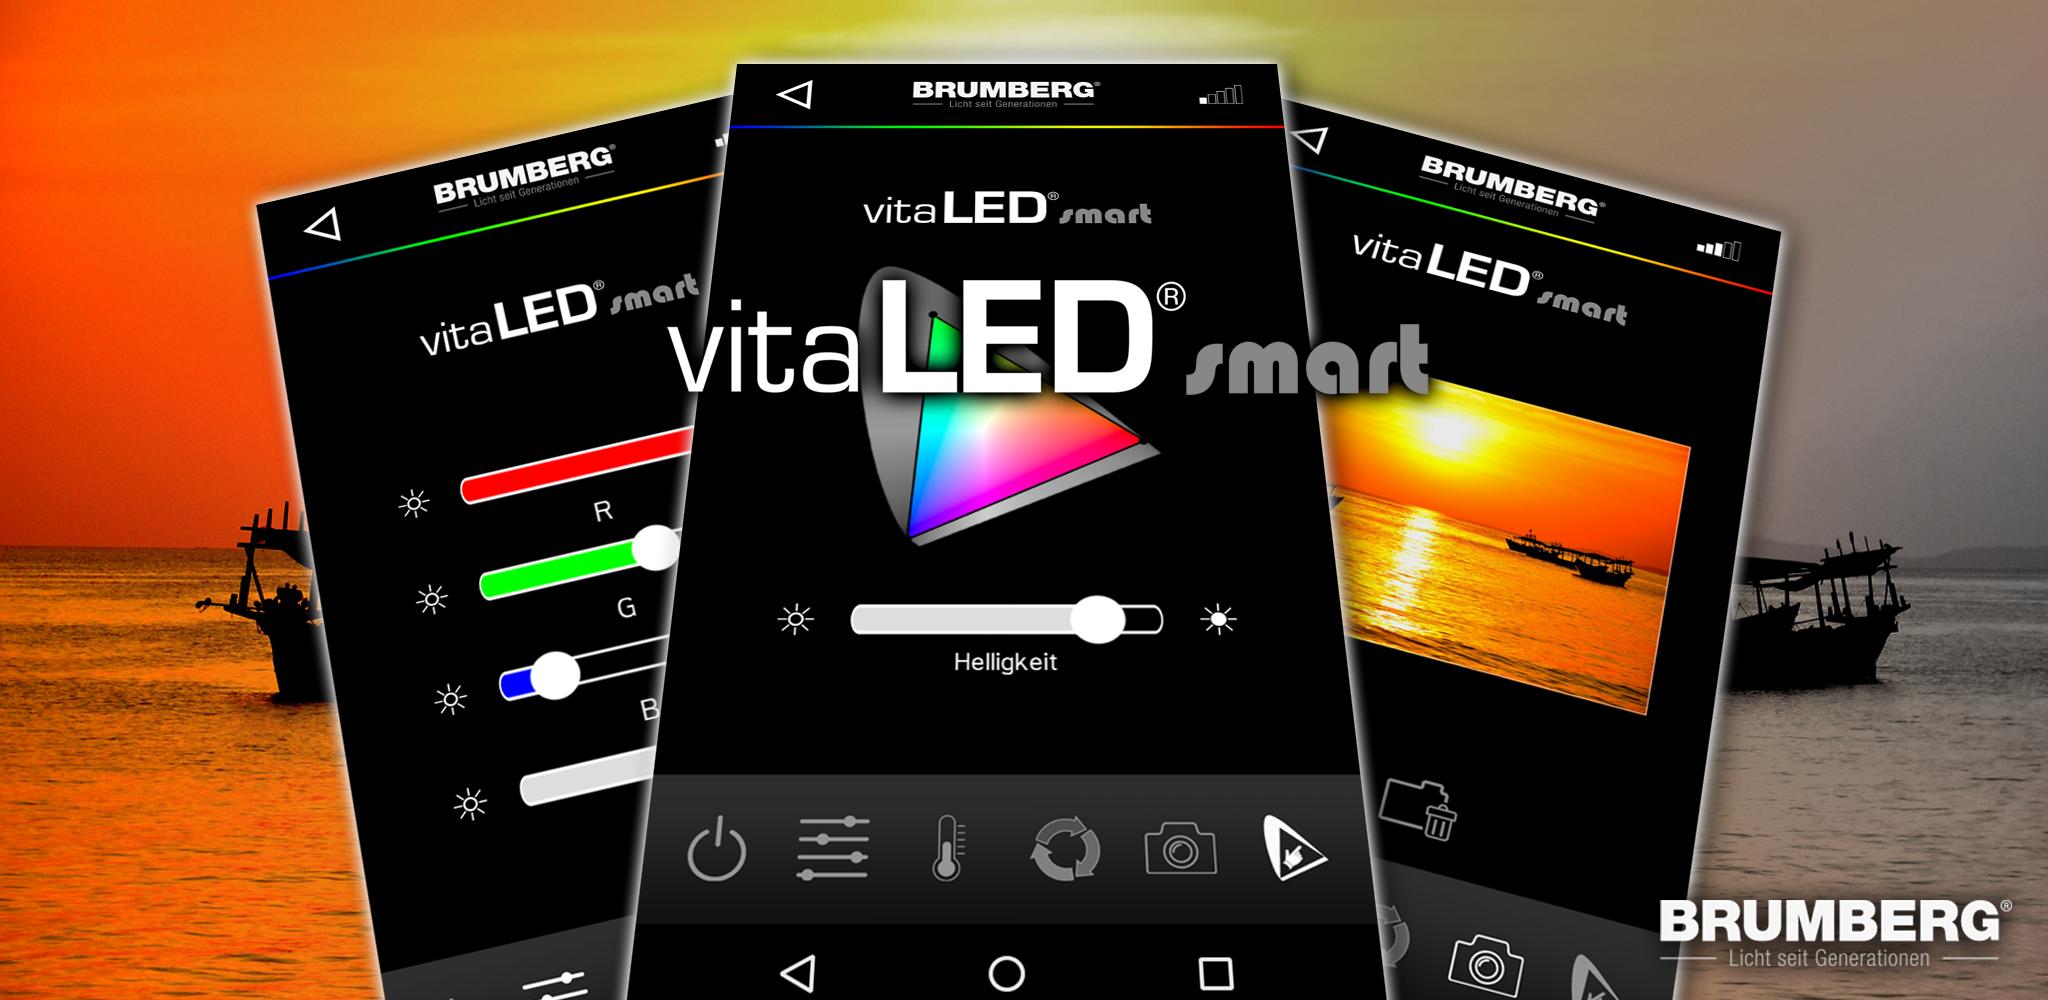 vita LED smart App